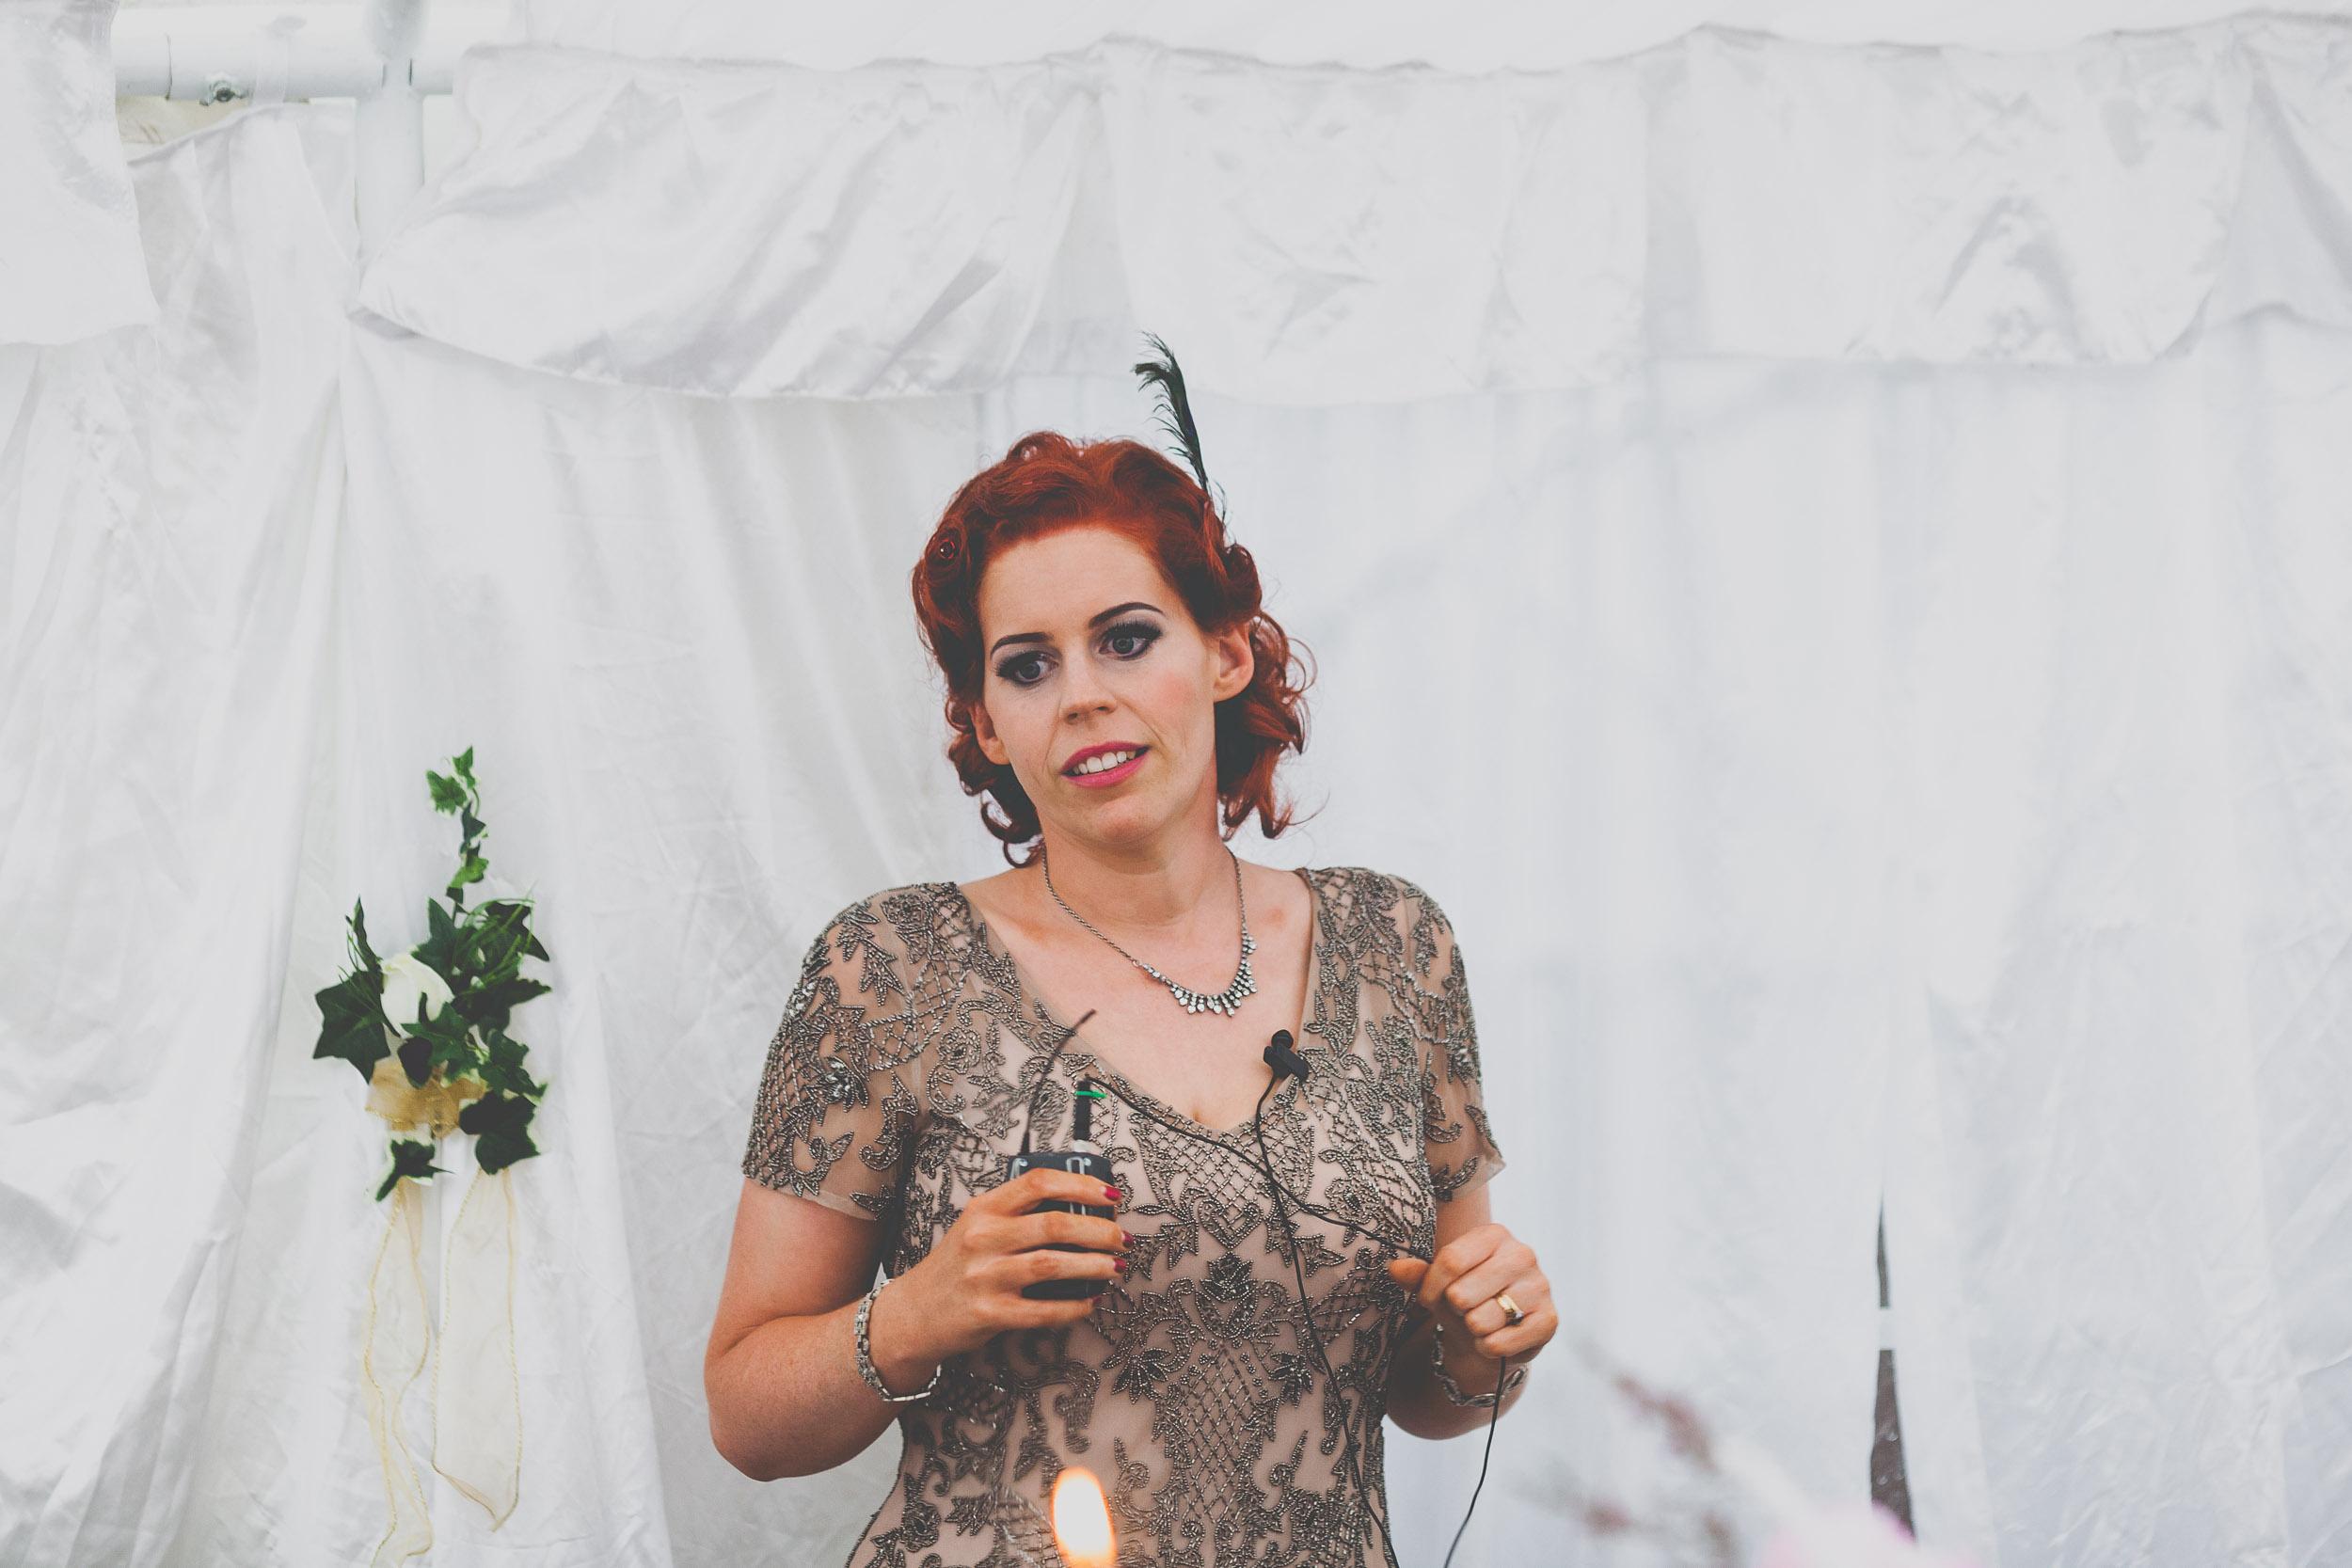 queen-elizabeths-hunting-lodge-epping-forest-wedding350.jpg